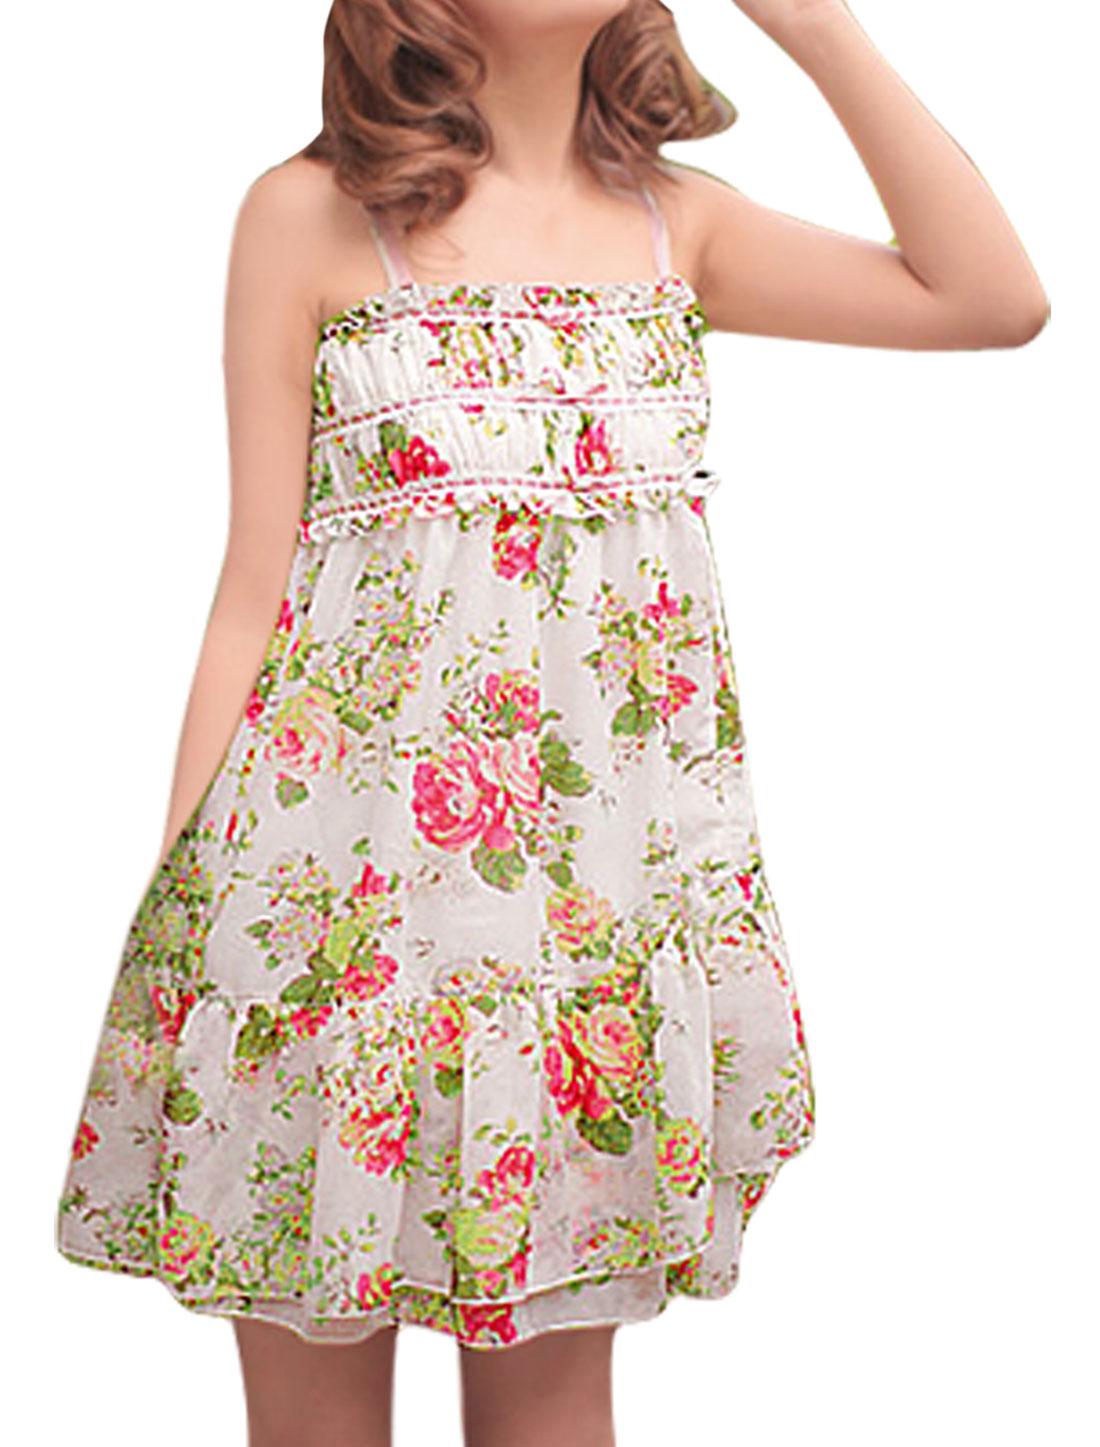 Women Spaghetti Straps Ruffled Hem Floral Chiffon Dress White XS